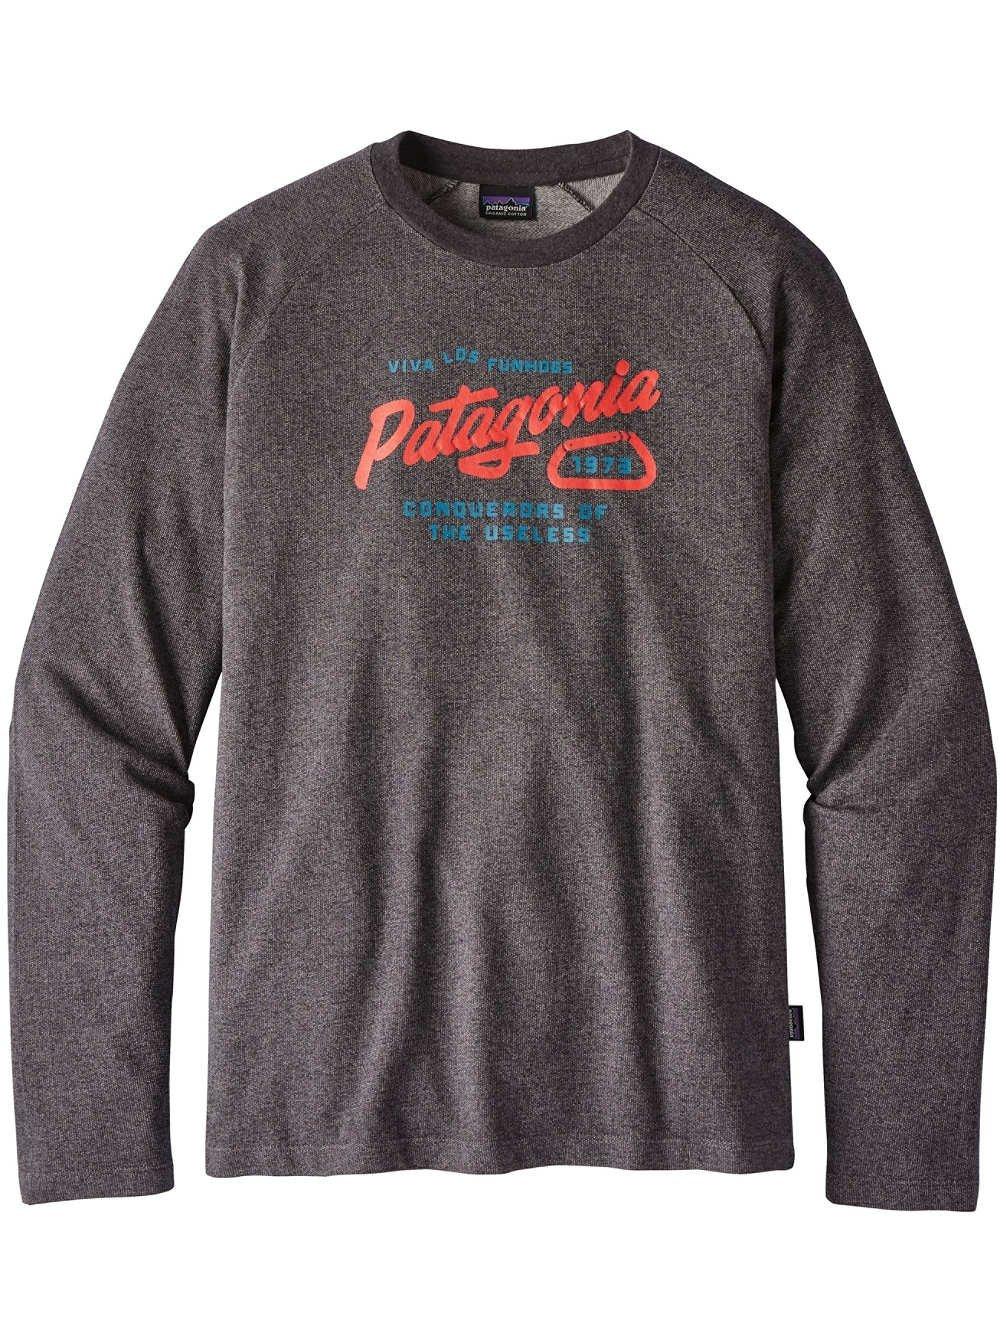 Patagonia M 'S Splitter Skript LW Crew Sweatshirt, Sweatshirt